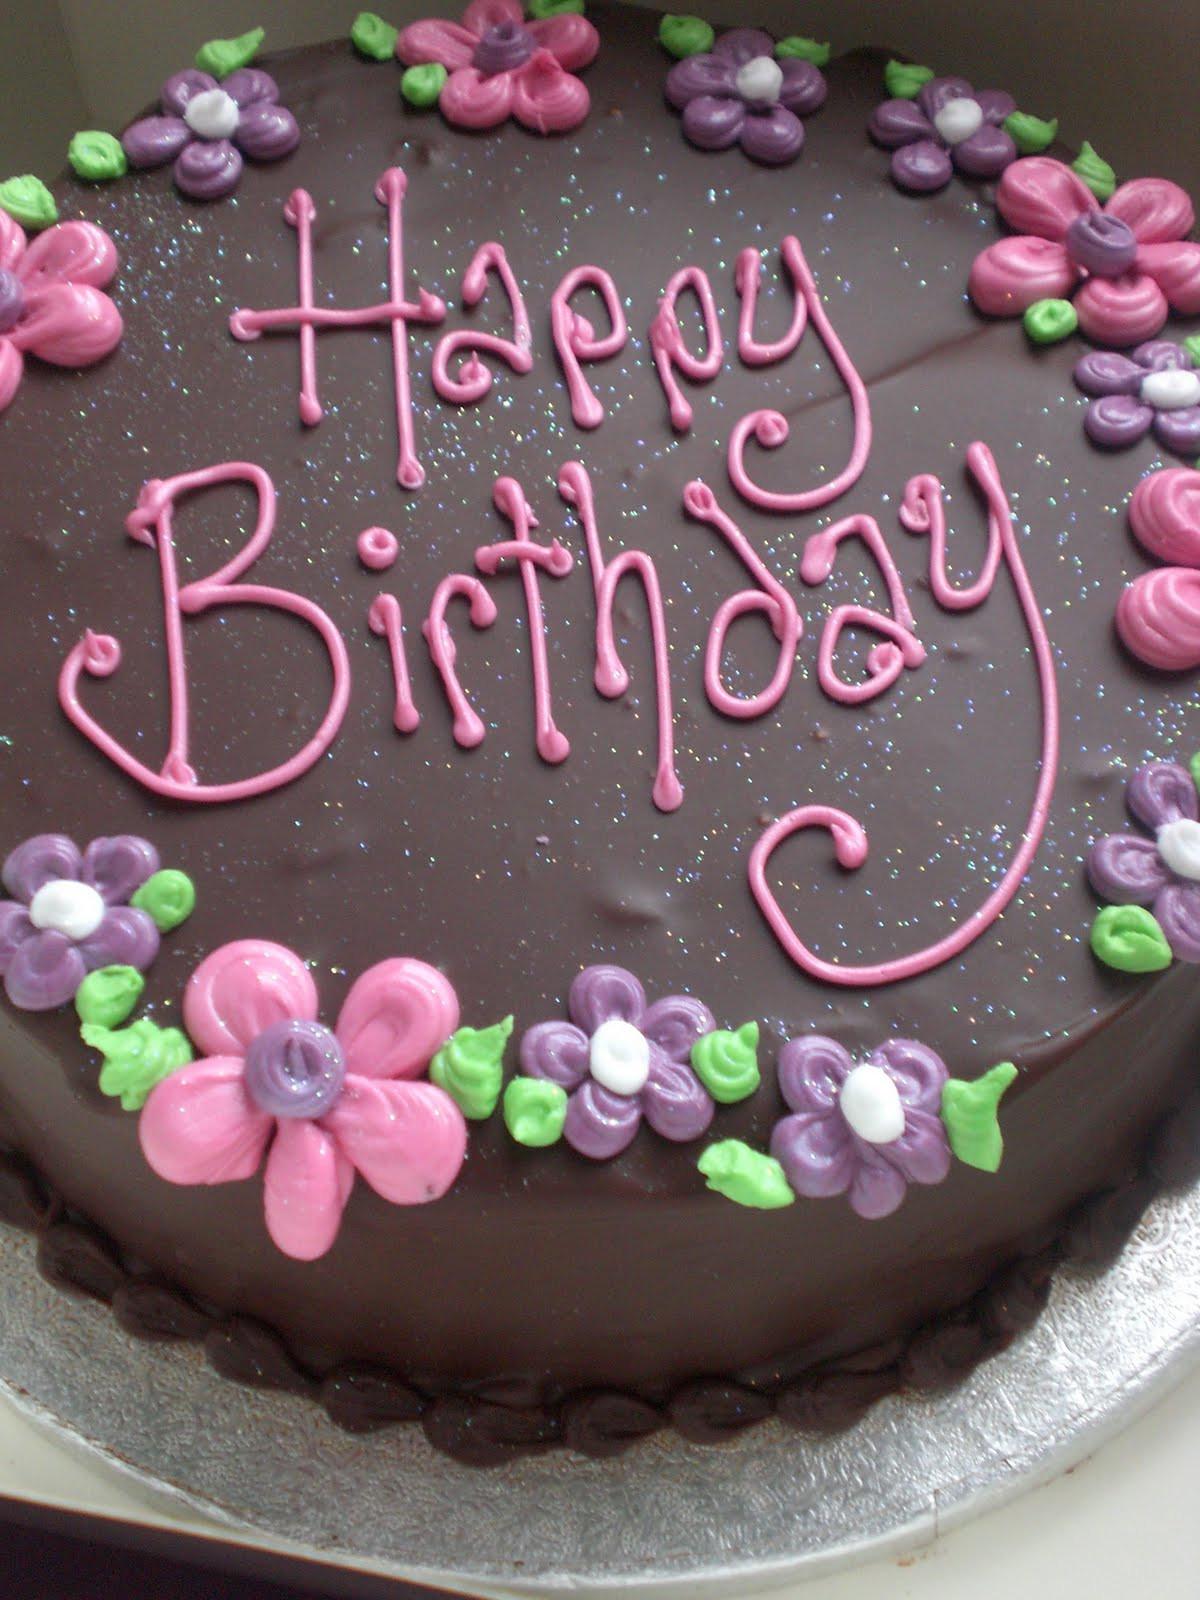 Happy Birthday Cake Image  Happy Birthday eCards Cakes Wishes SMS Dress Recipes Poem